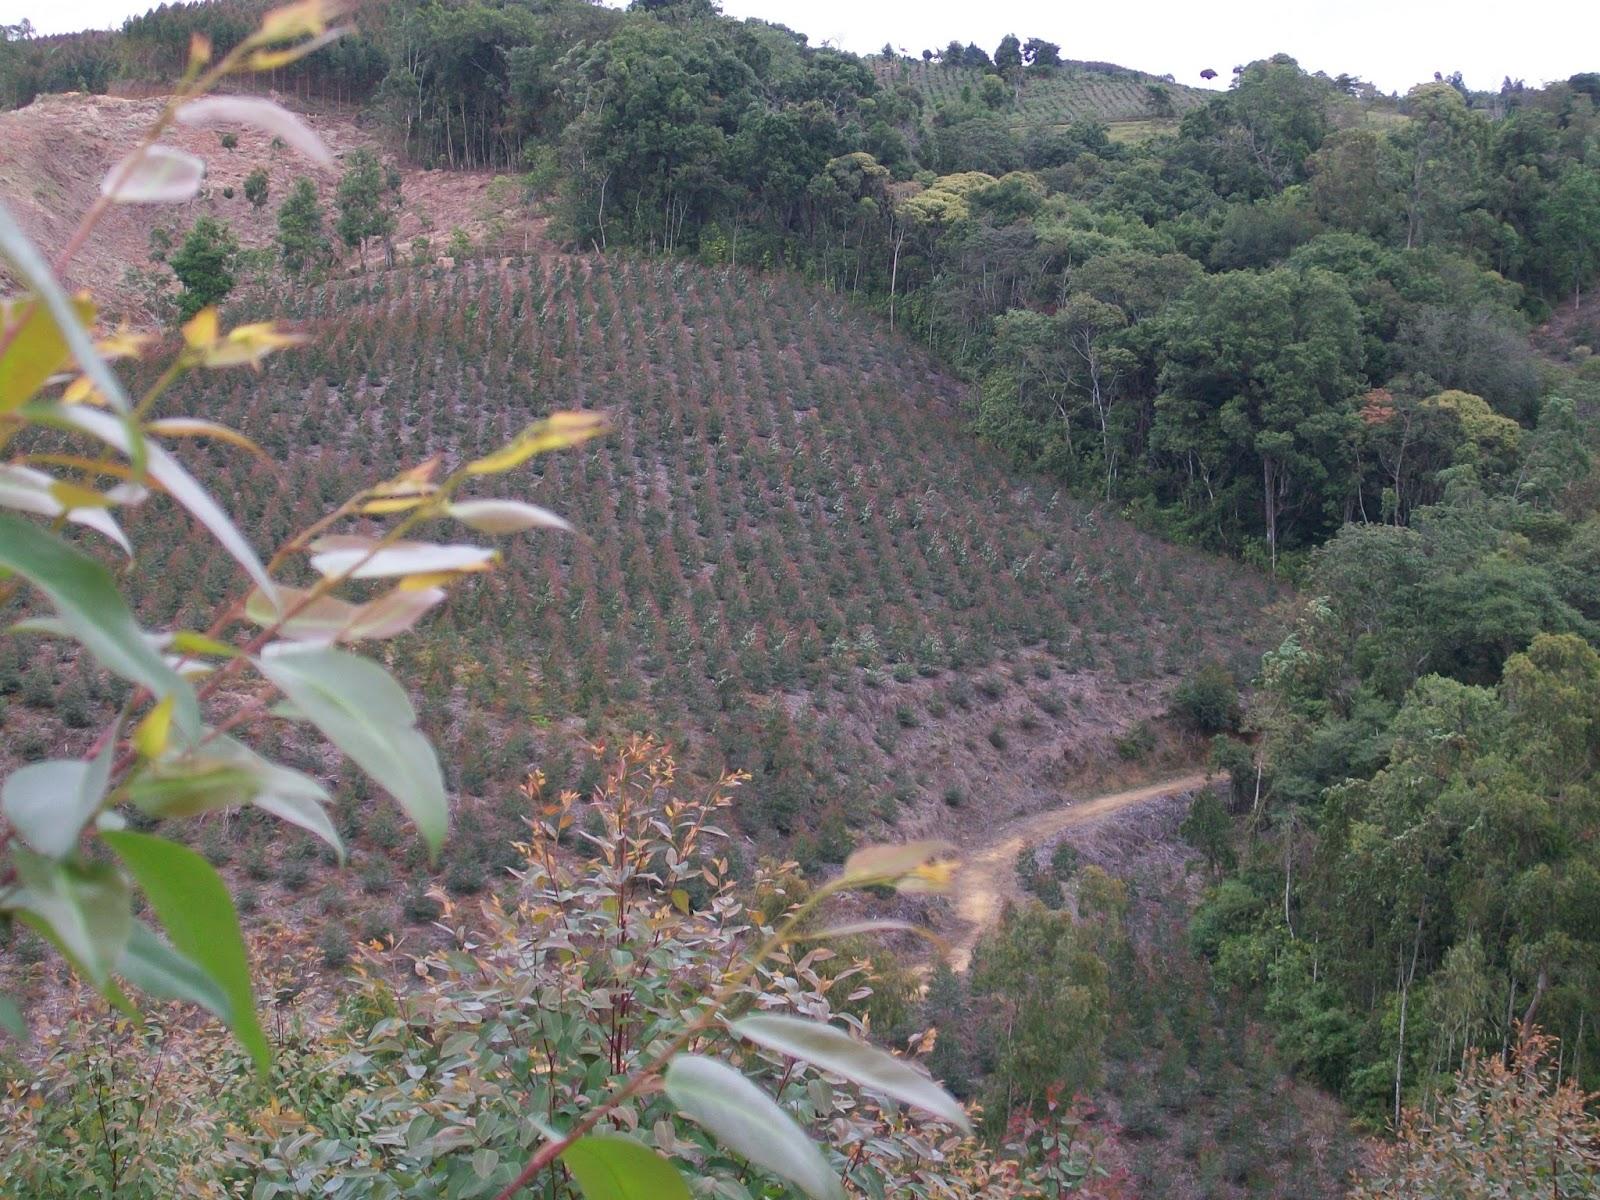 Cooperativa agroforestal del cauca vivero forestal cootraforc for Viveros forestales en colombia